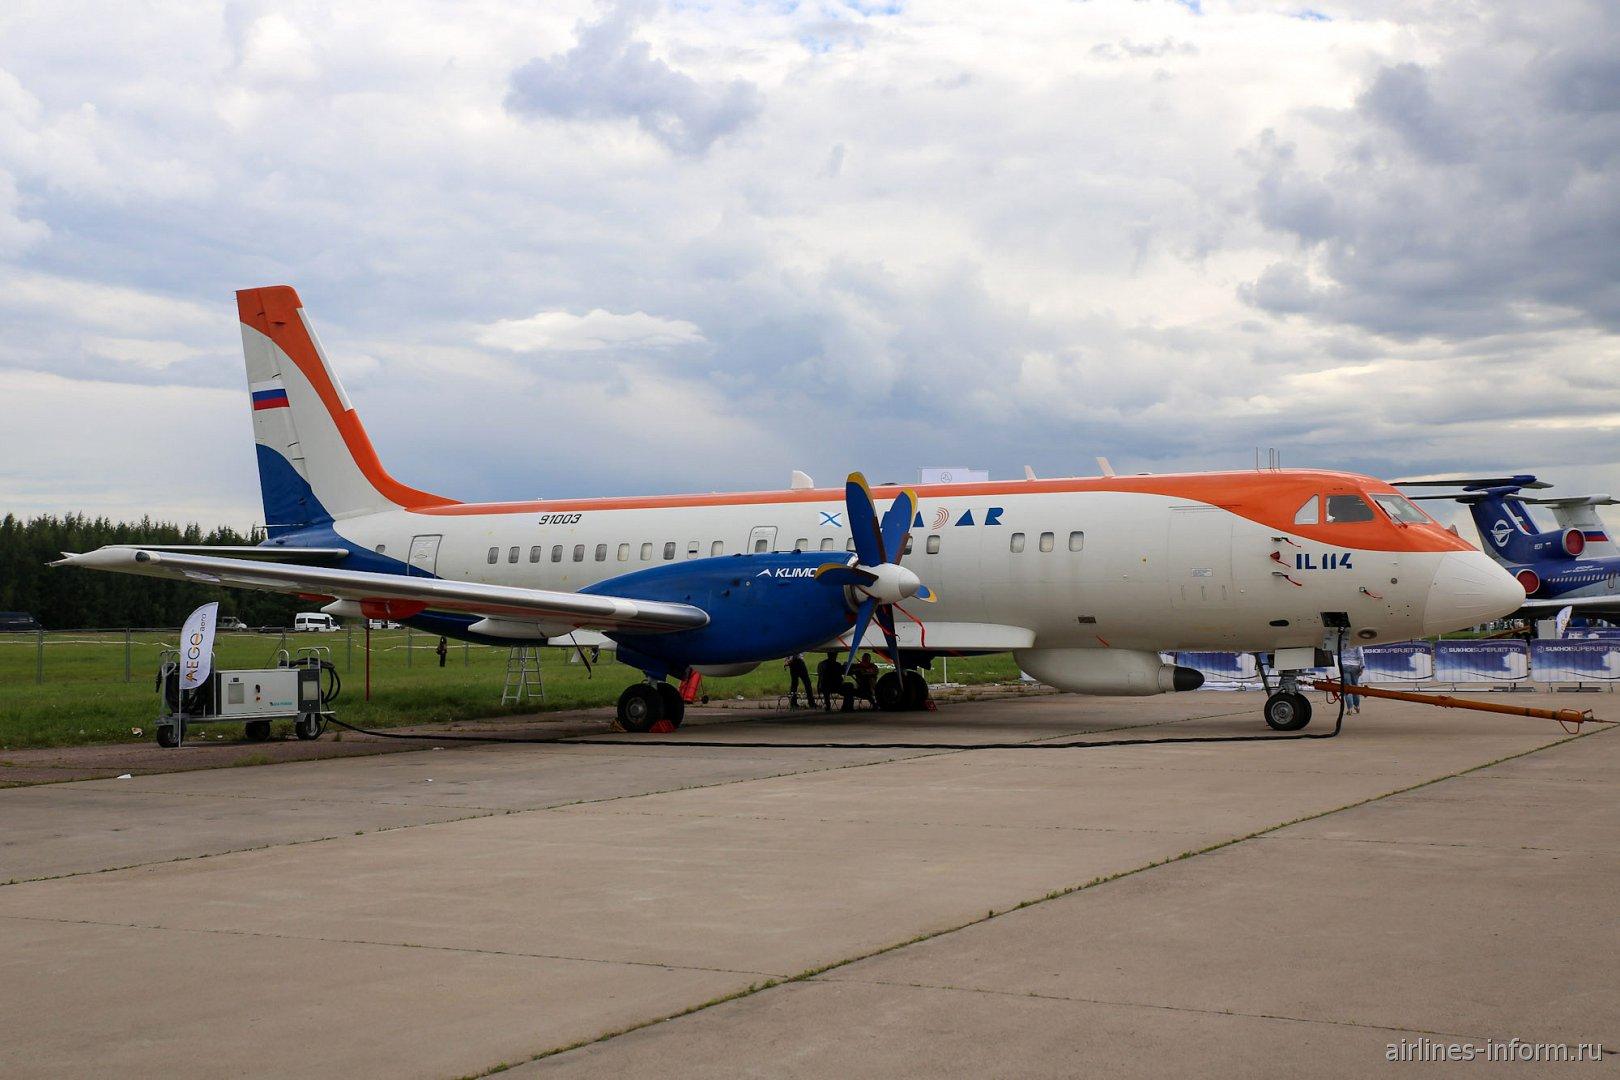 Самолет Ил-114 на авиасалоне МАКС-2017